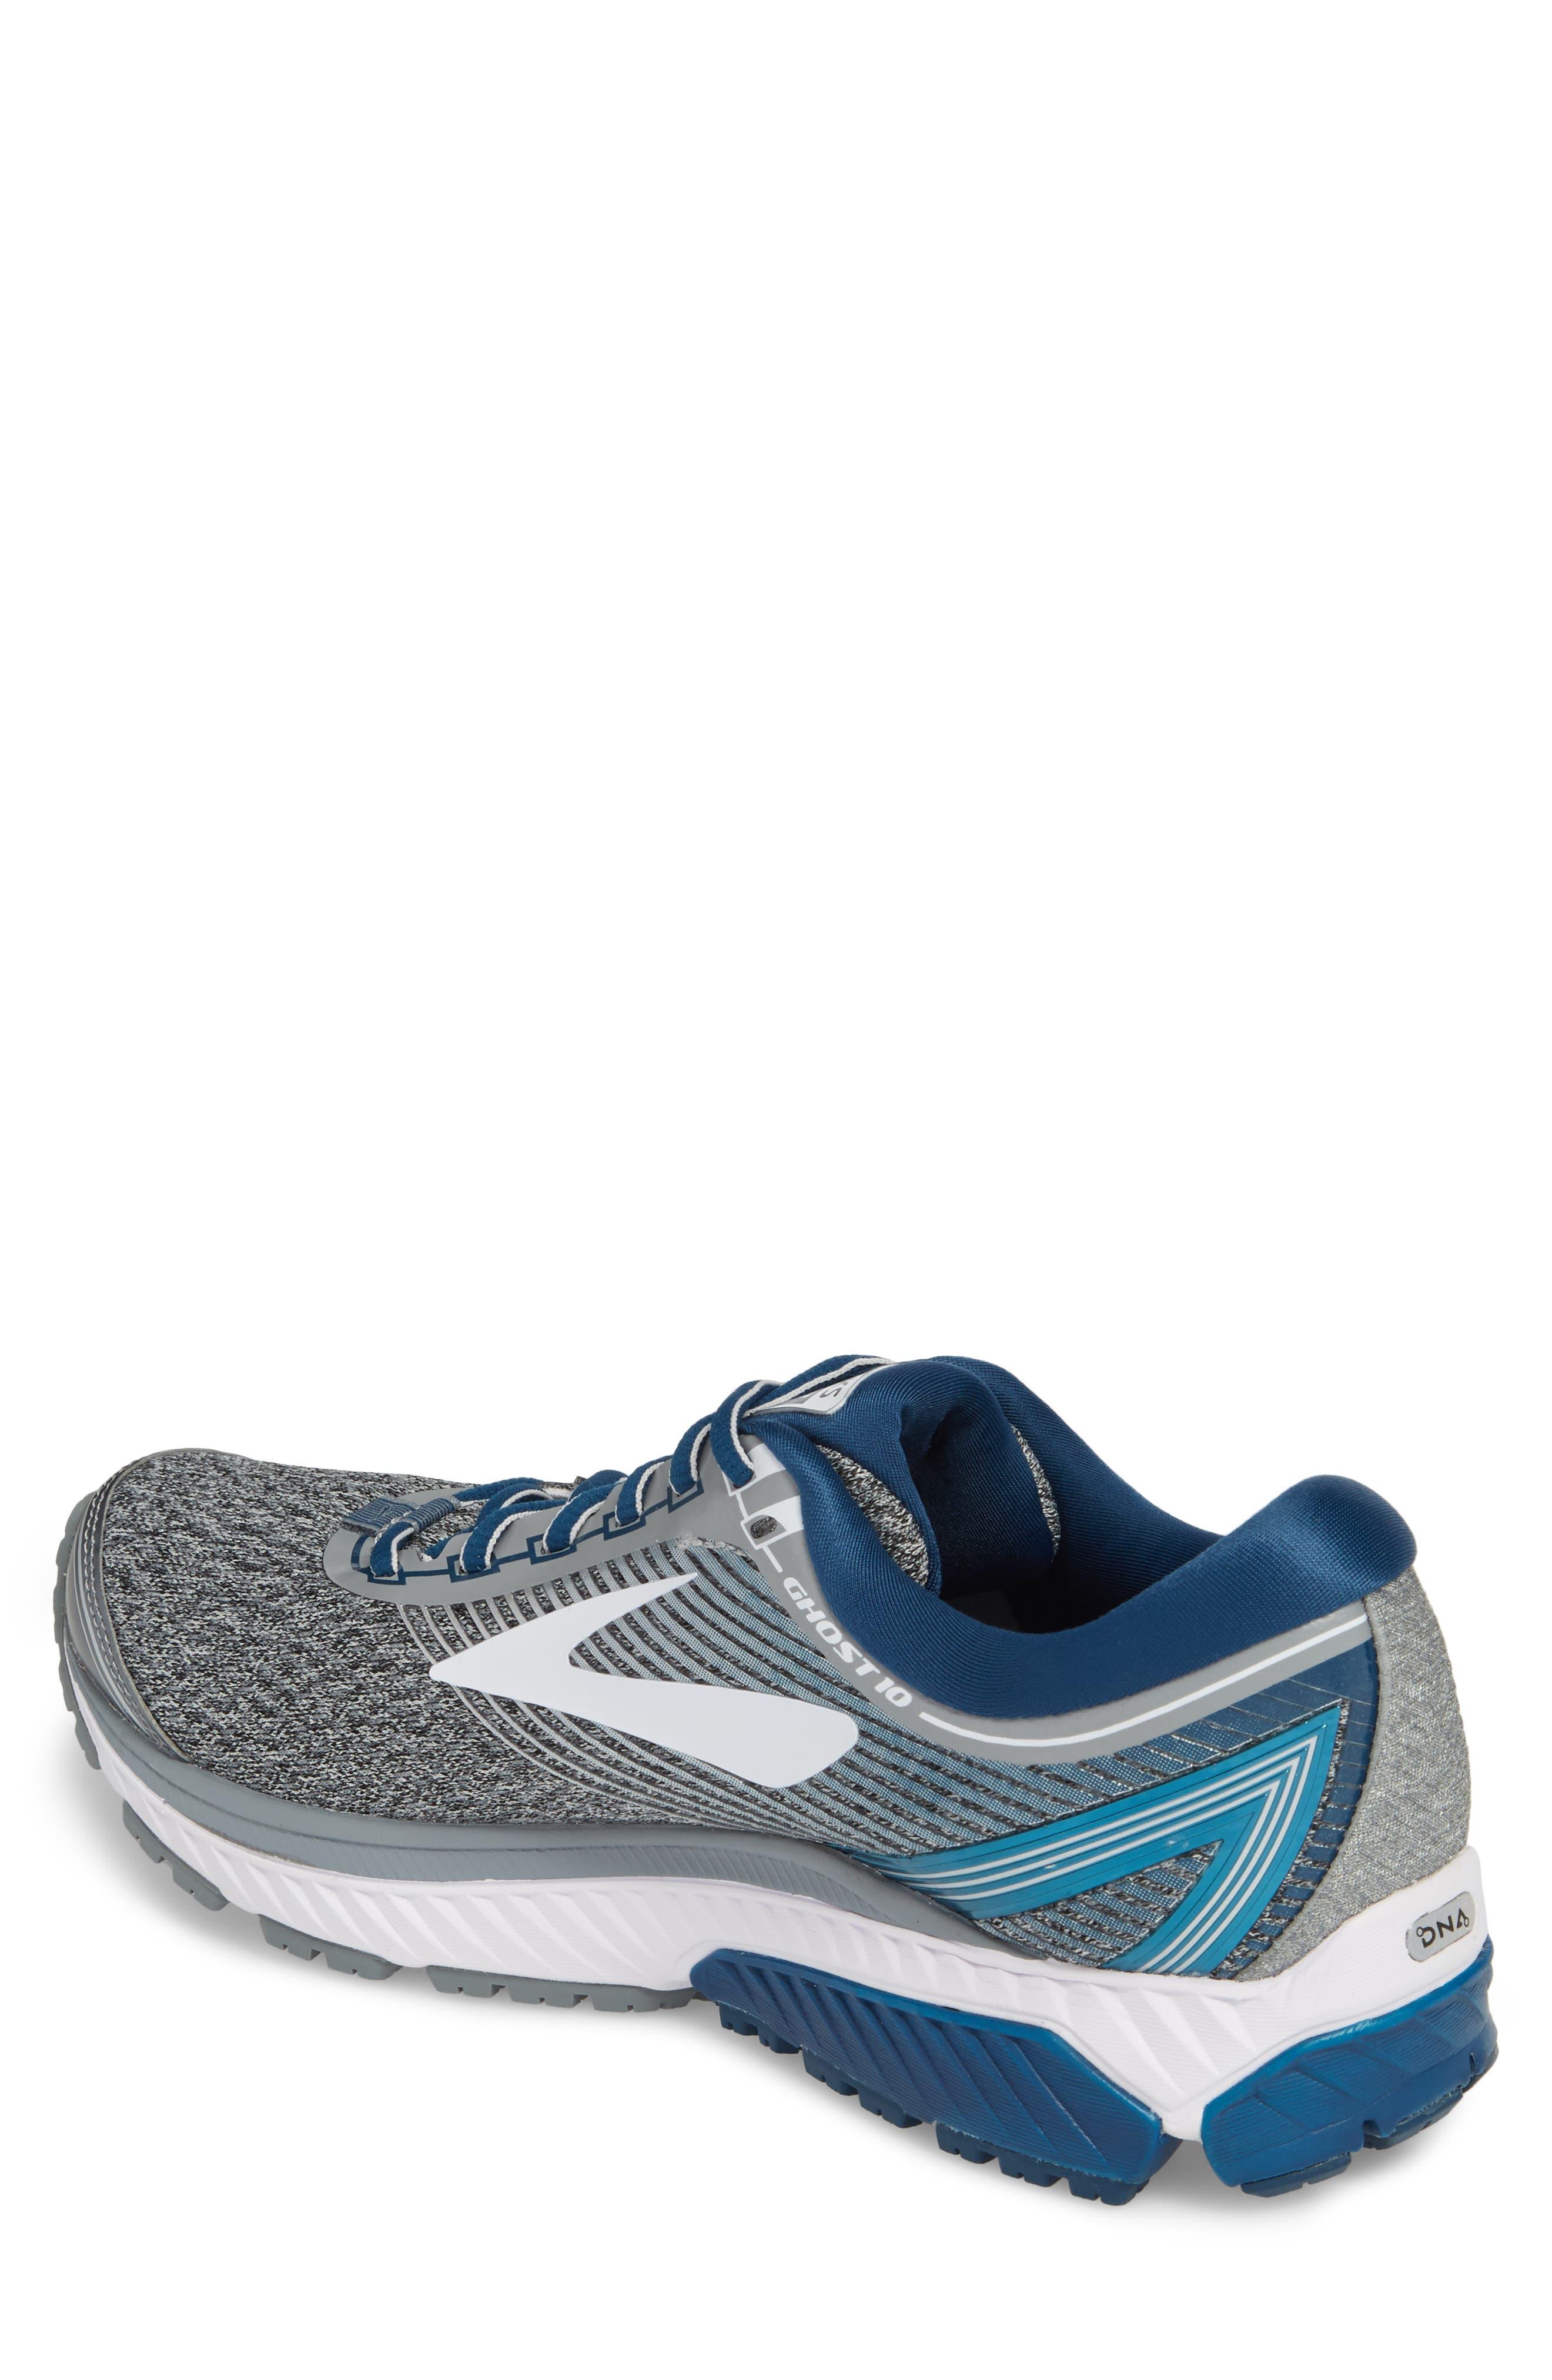 Ghost 10 Running Shoe,                             Alternate thumbnail 2, color,                             SILVER/ BLUE/ WHITE